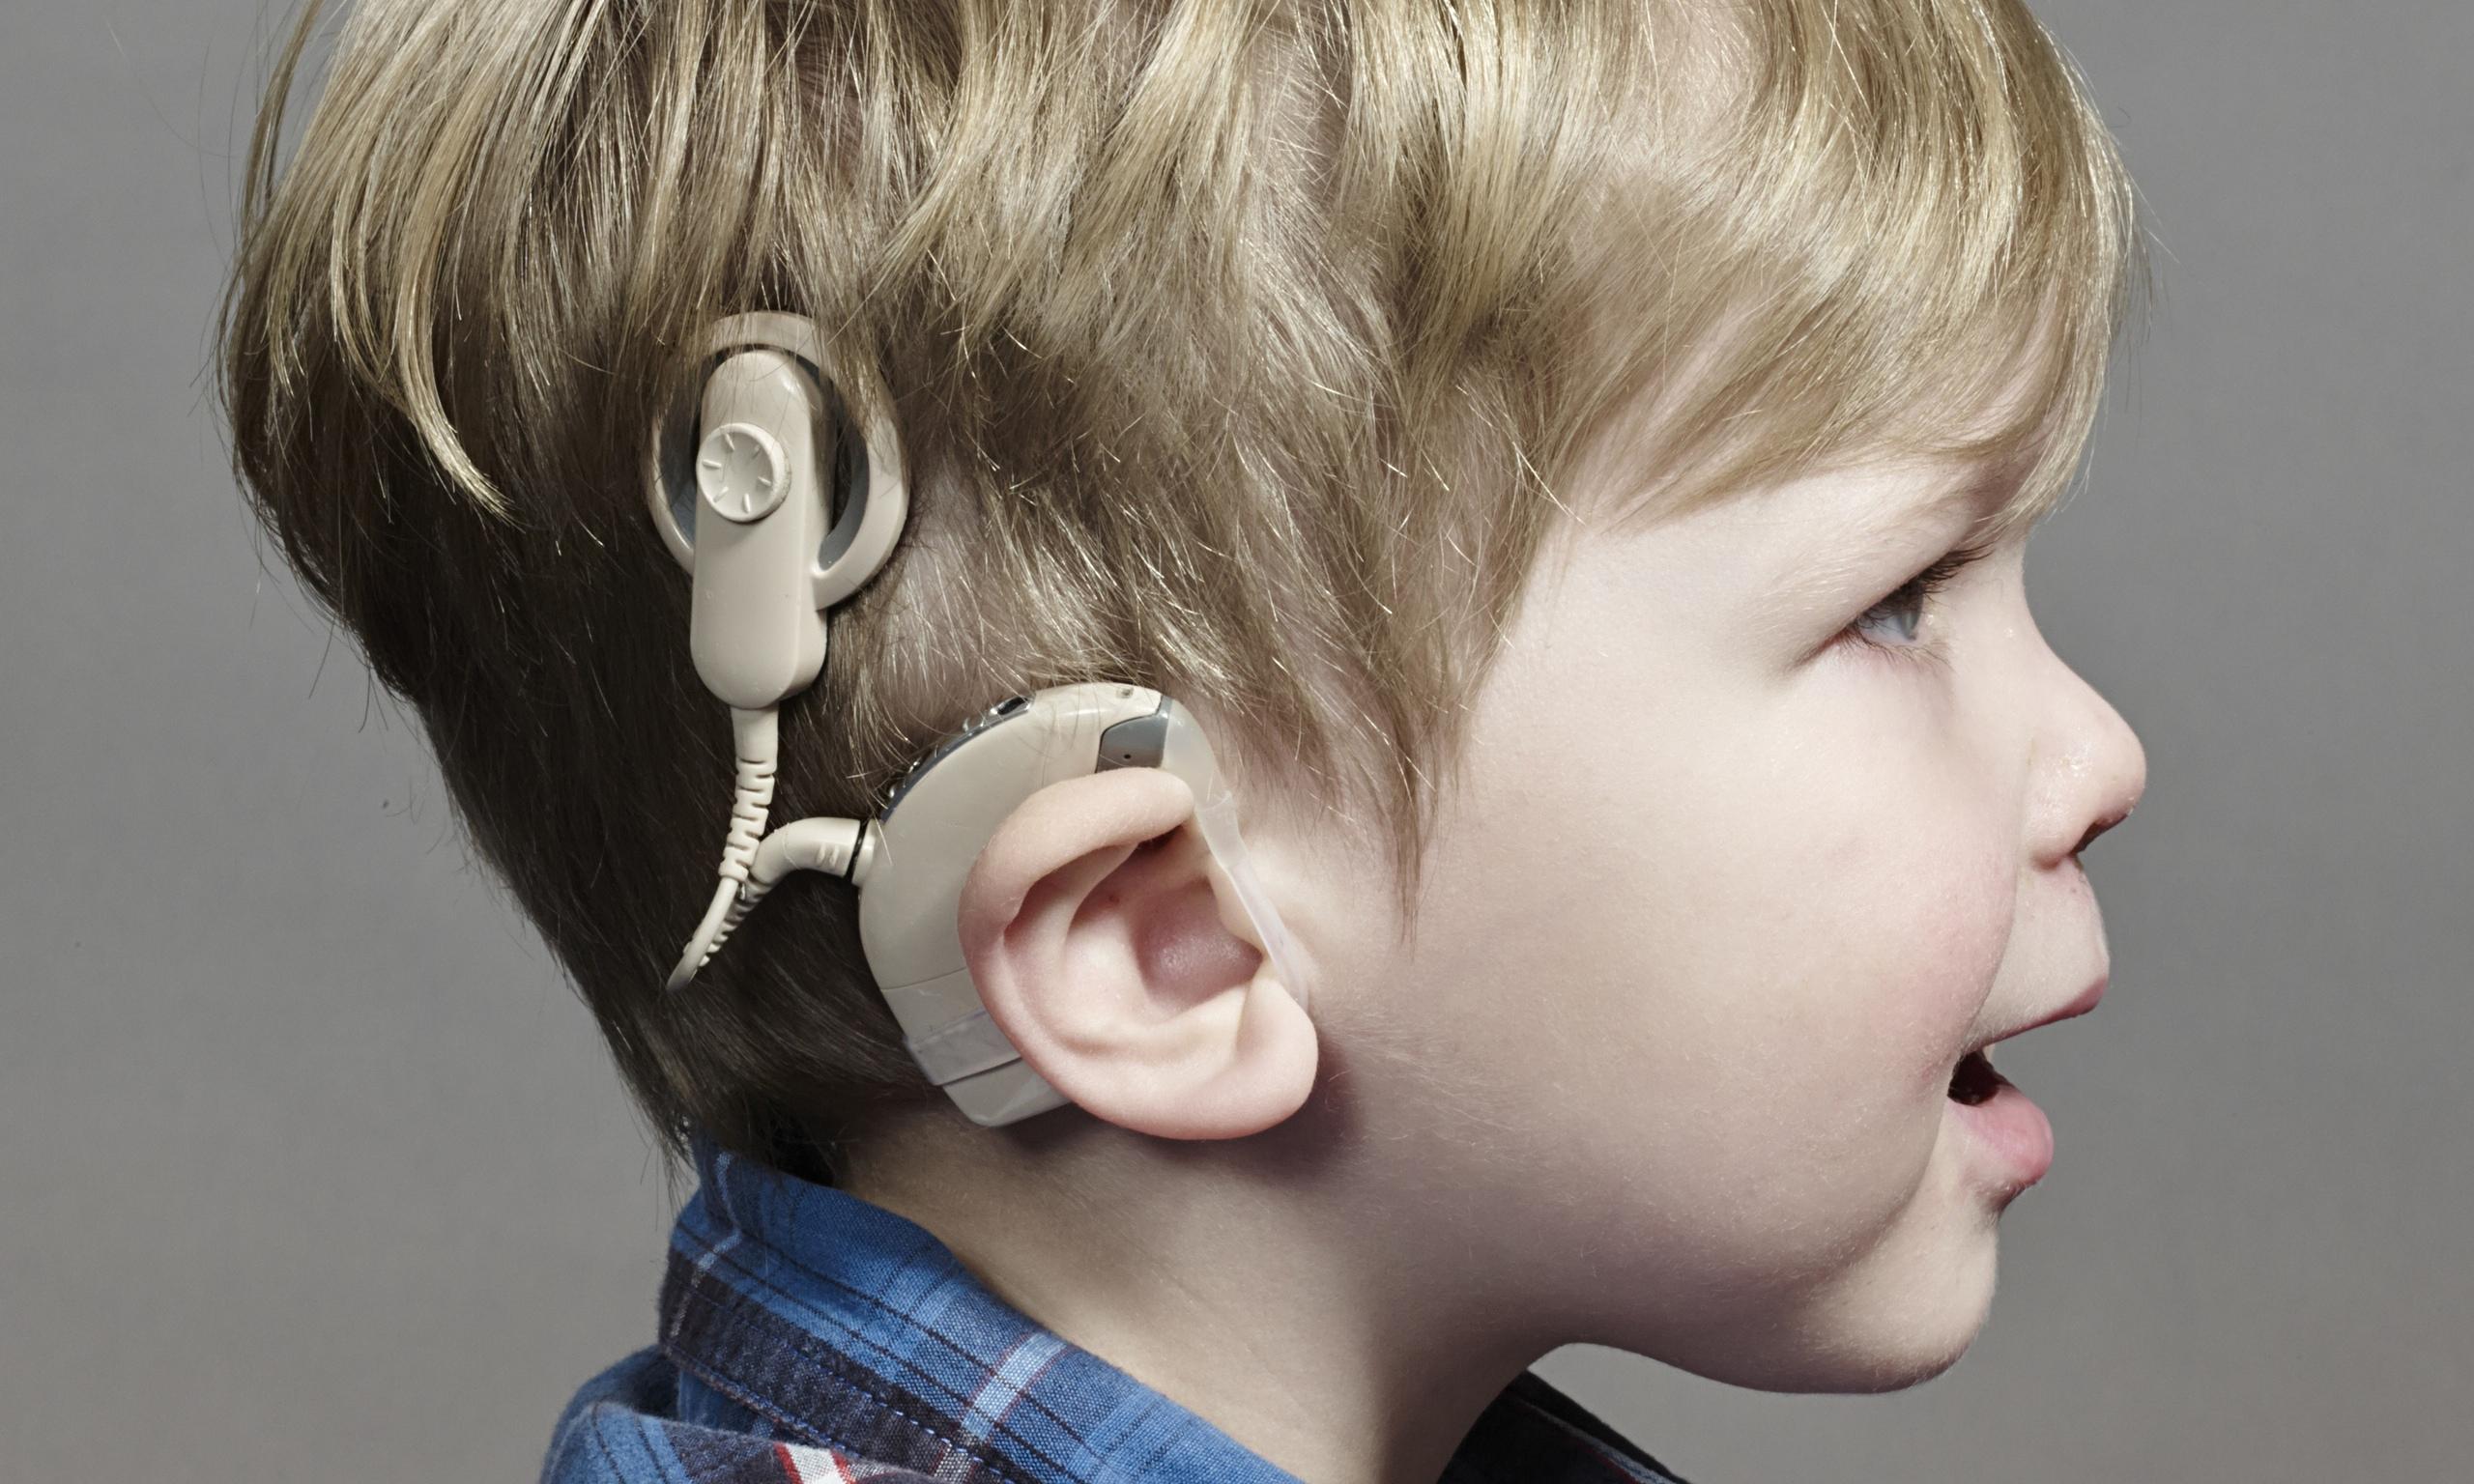 Фото детей в слуховых аппаратах